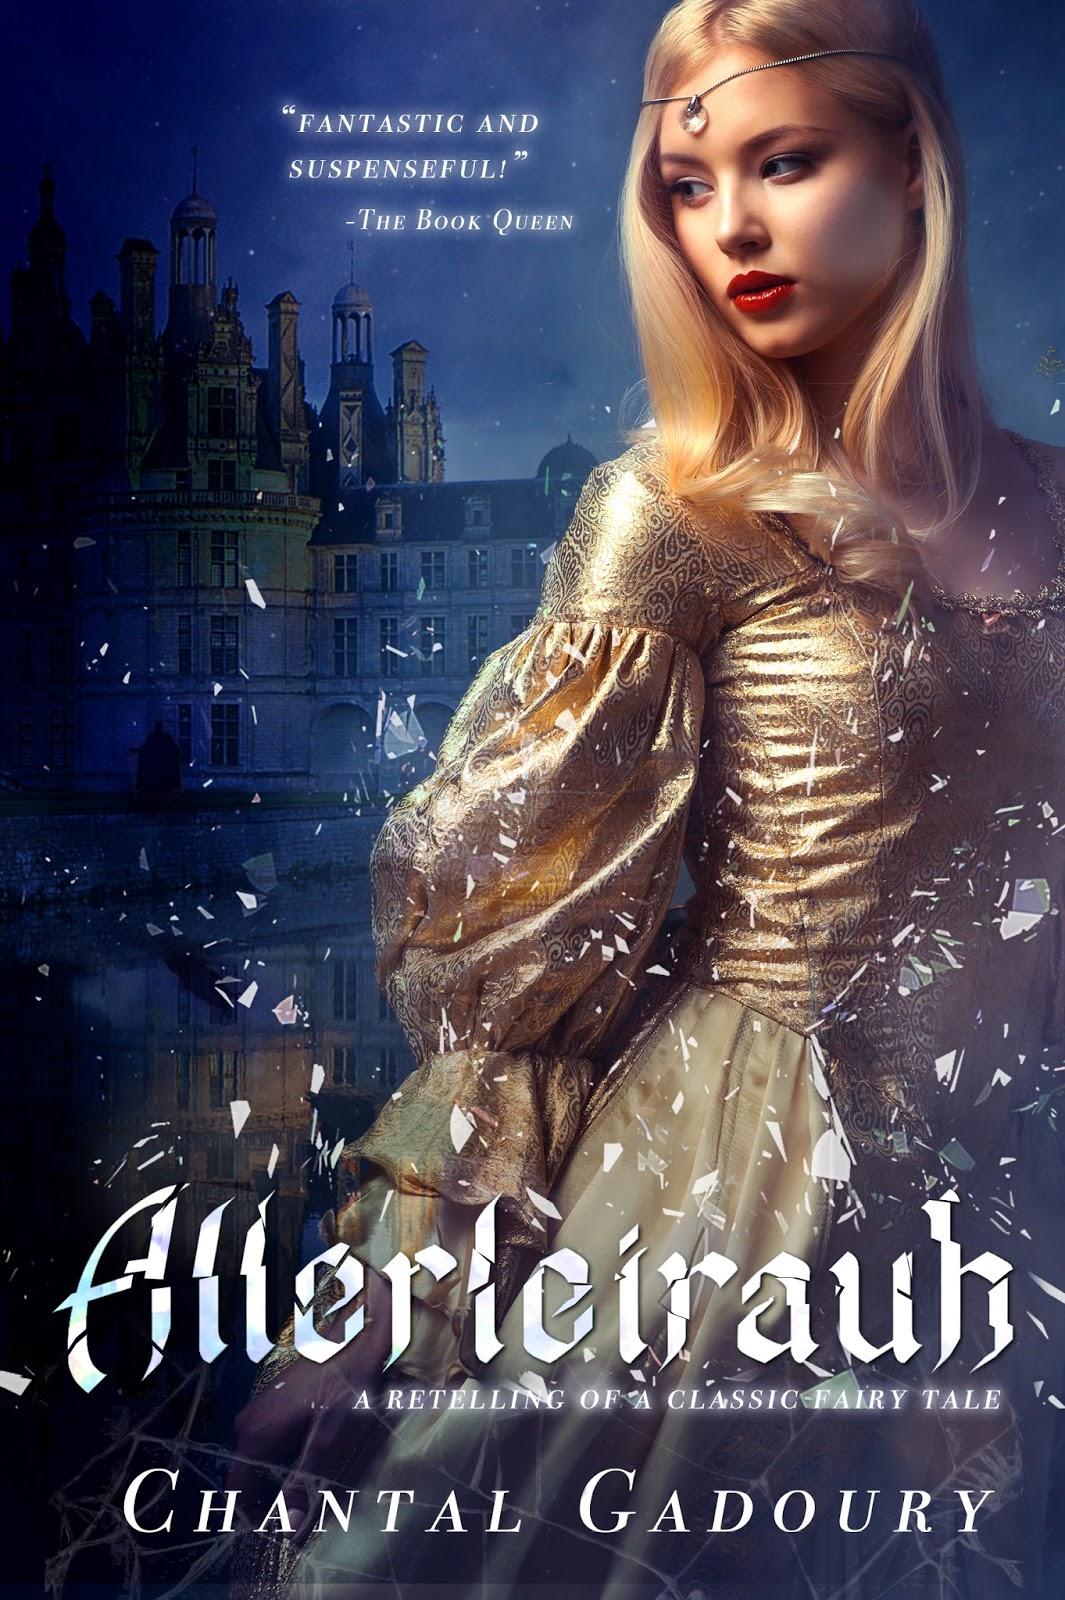 Title: Allerleirauh Author: Chantal Gadoury Genre: Historical Fantasy,  Fairytale Retelling Release Date: August 22, 2017